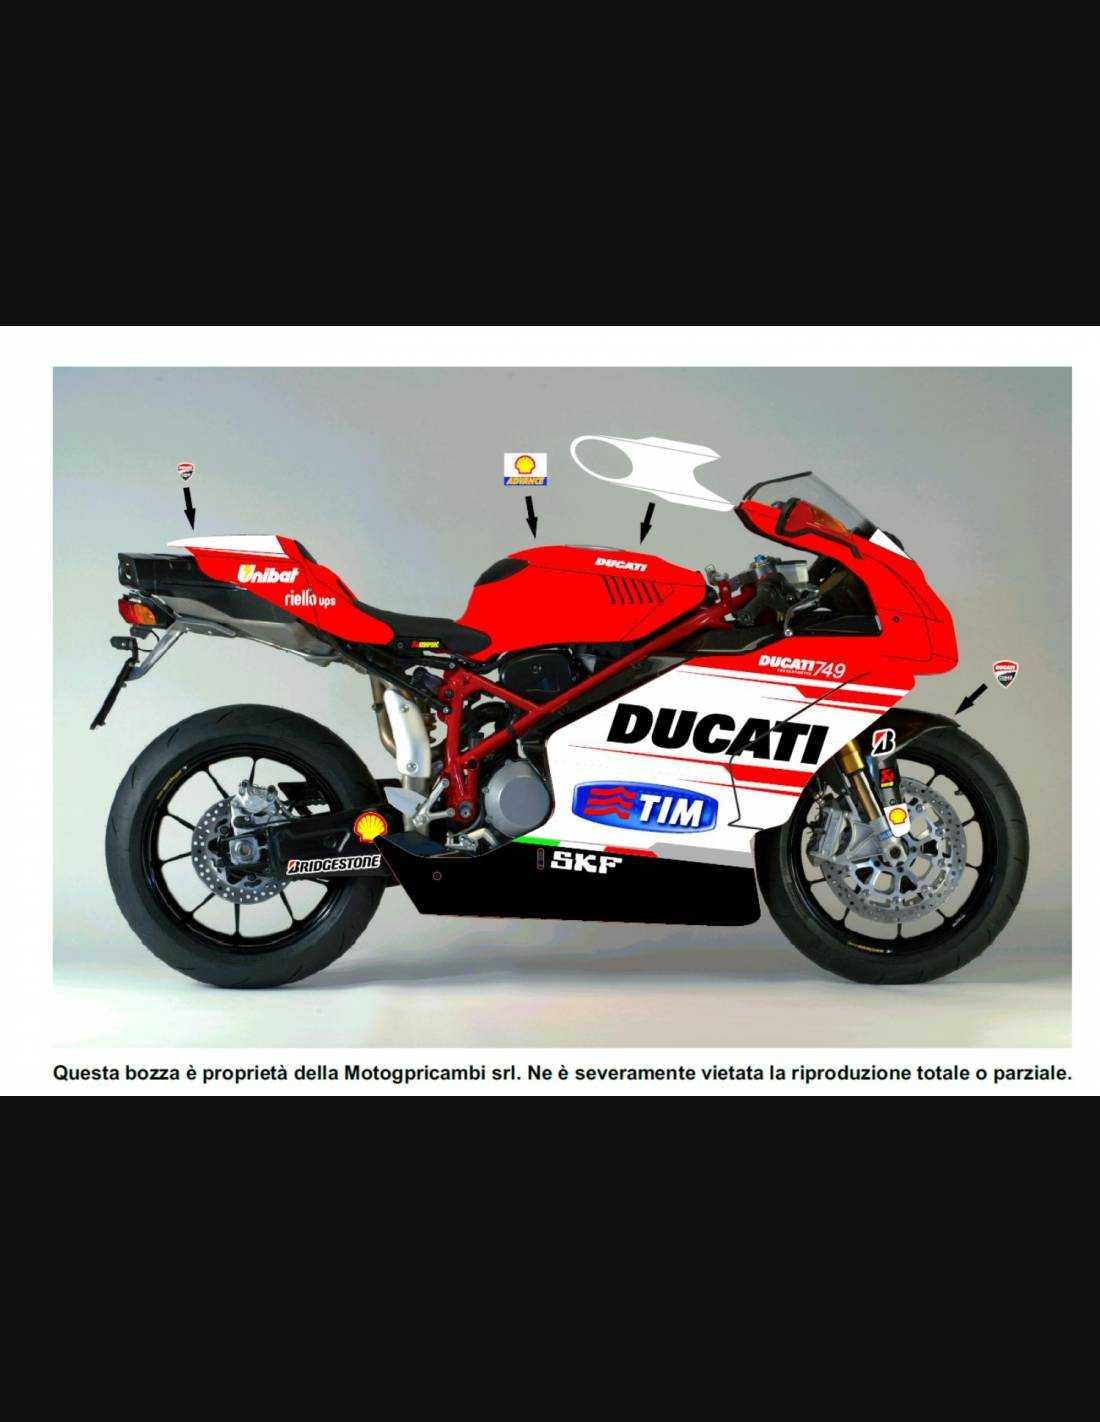 1 SET Motorcycle Fairing Bolt Kit For Ducati 748 1994–2003 Ducati 749 2003-2006